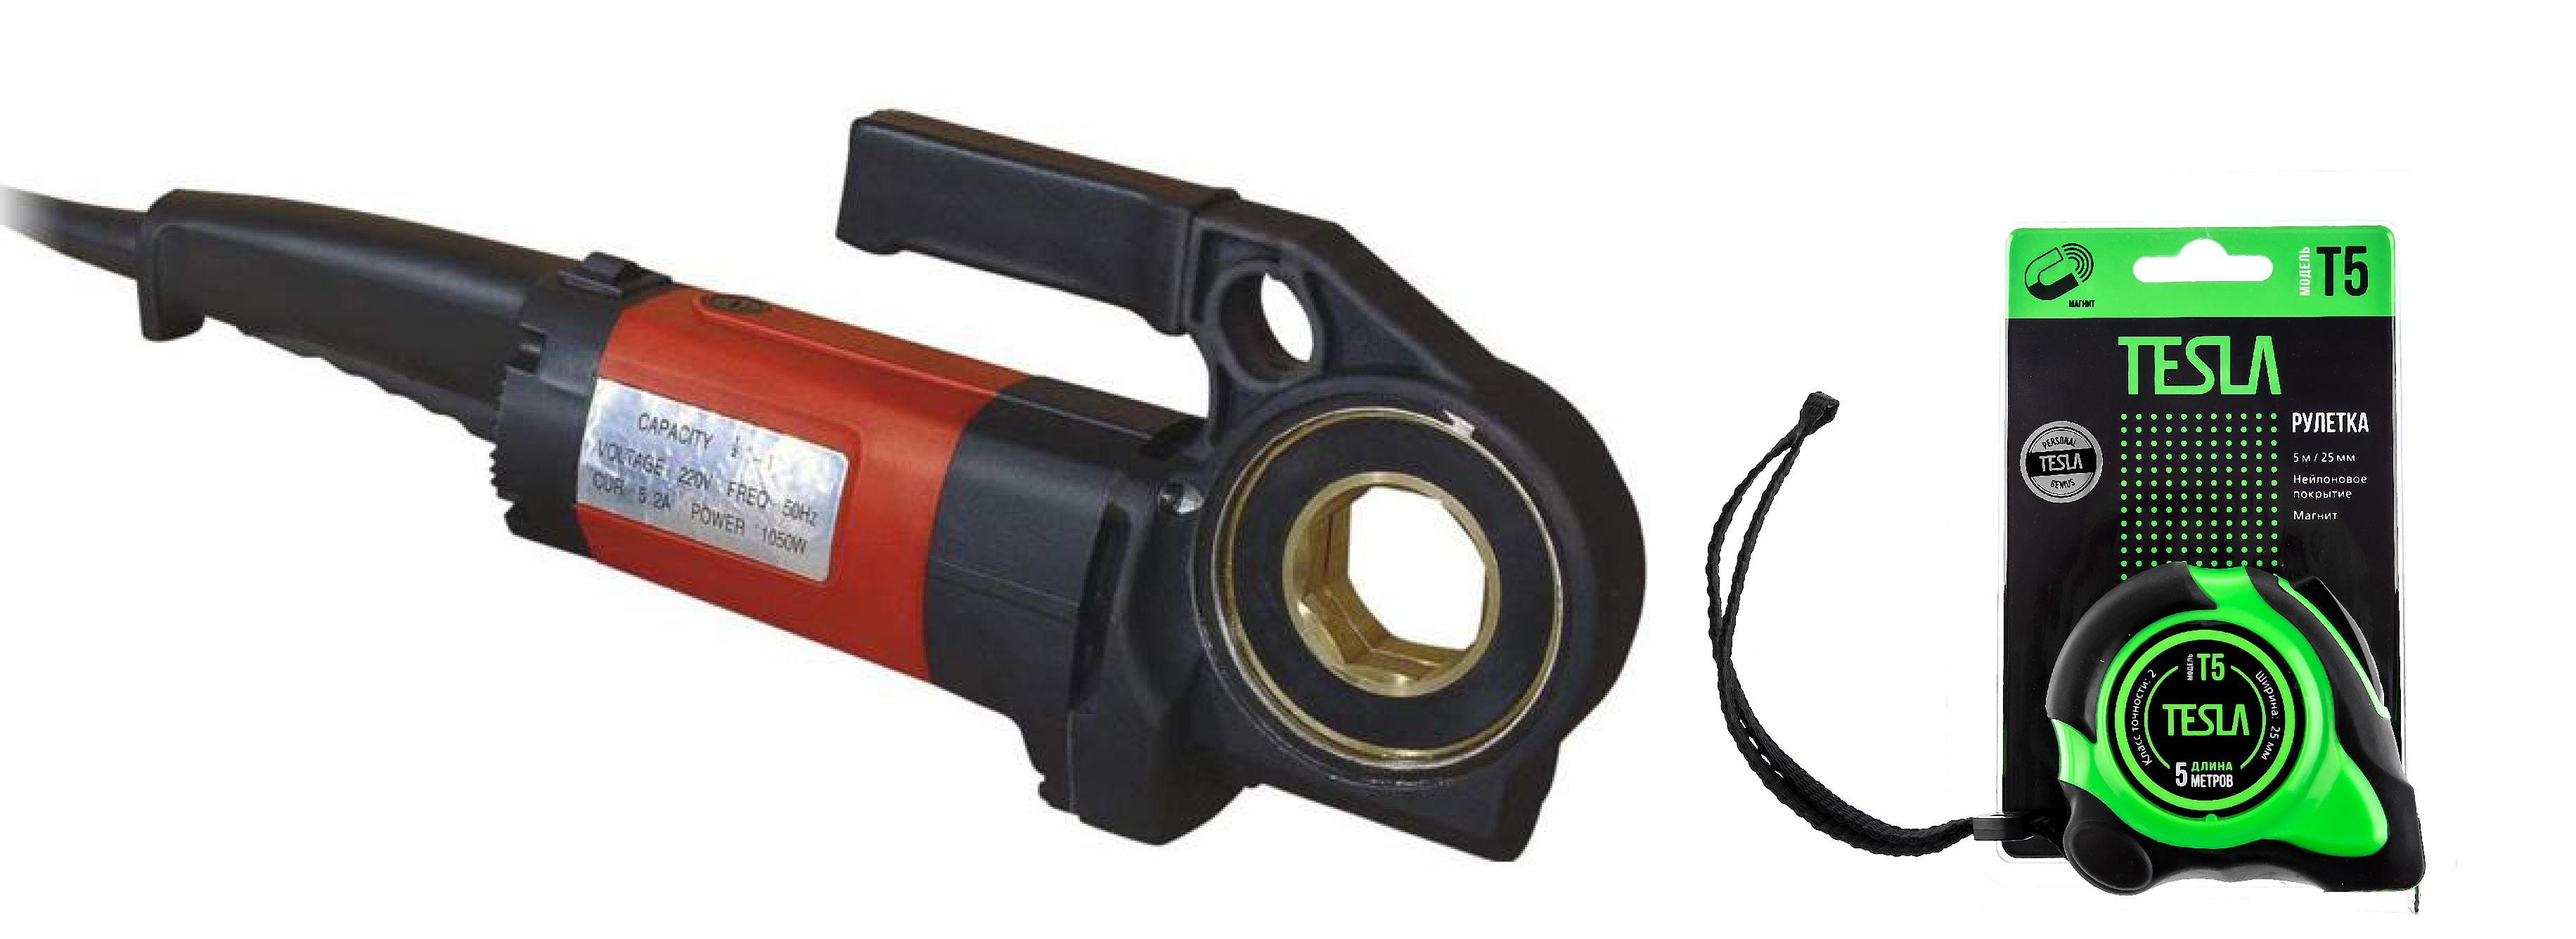 Набор Tor Электрический клупп sq30 +Рулетка 5м х 25мм (t-5)